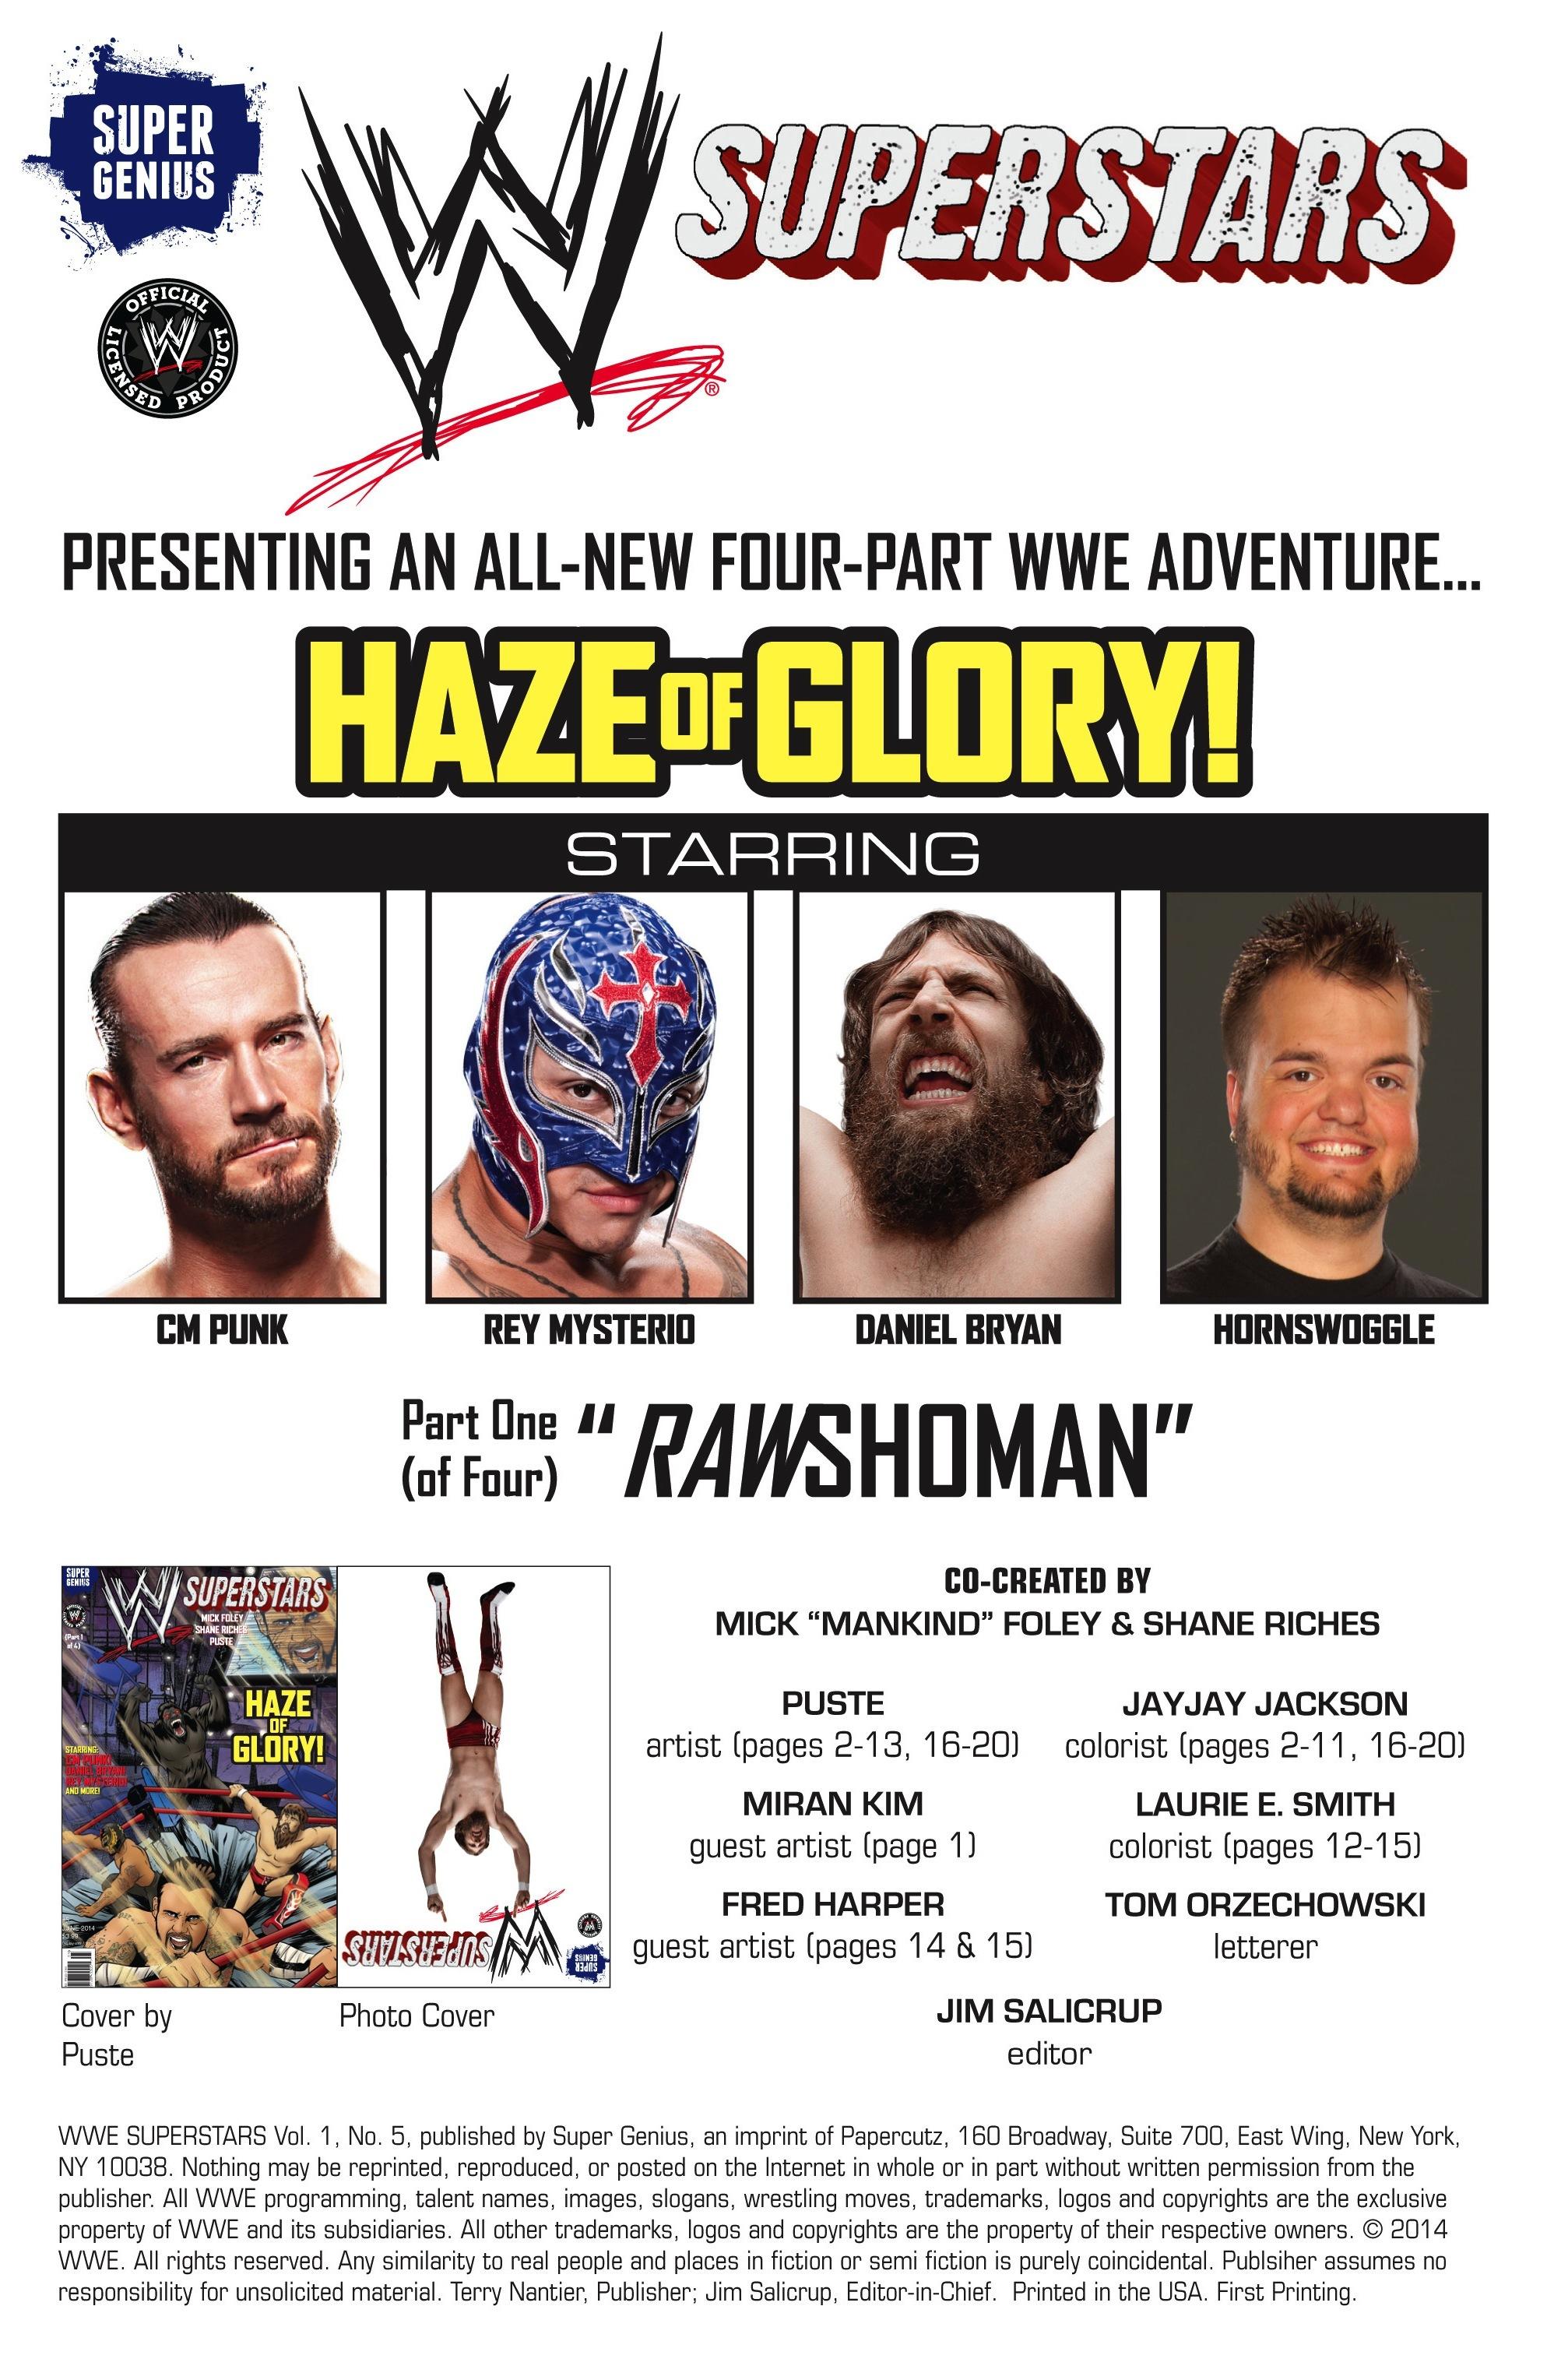 Read online WWE Superstars comic -  Issue #5 - 2